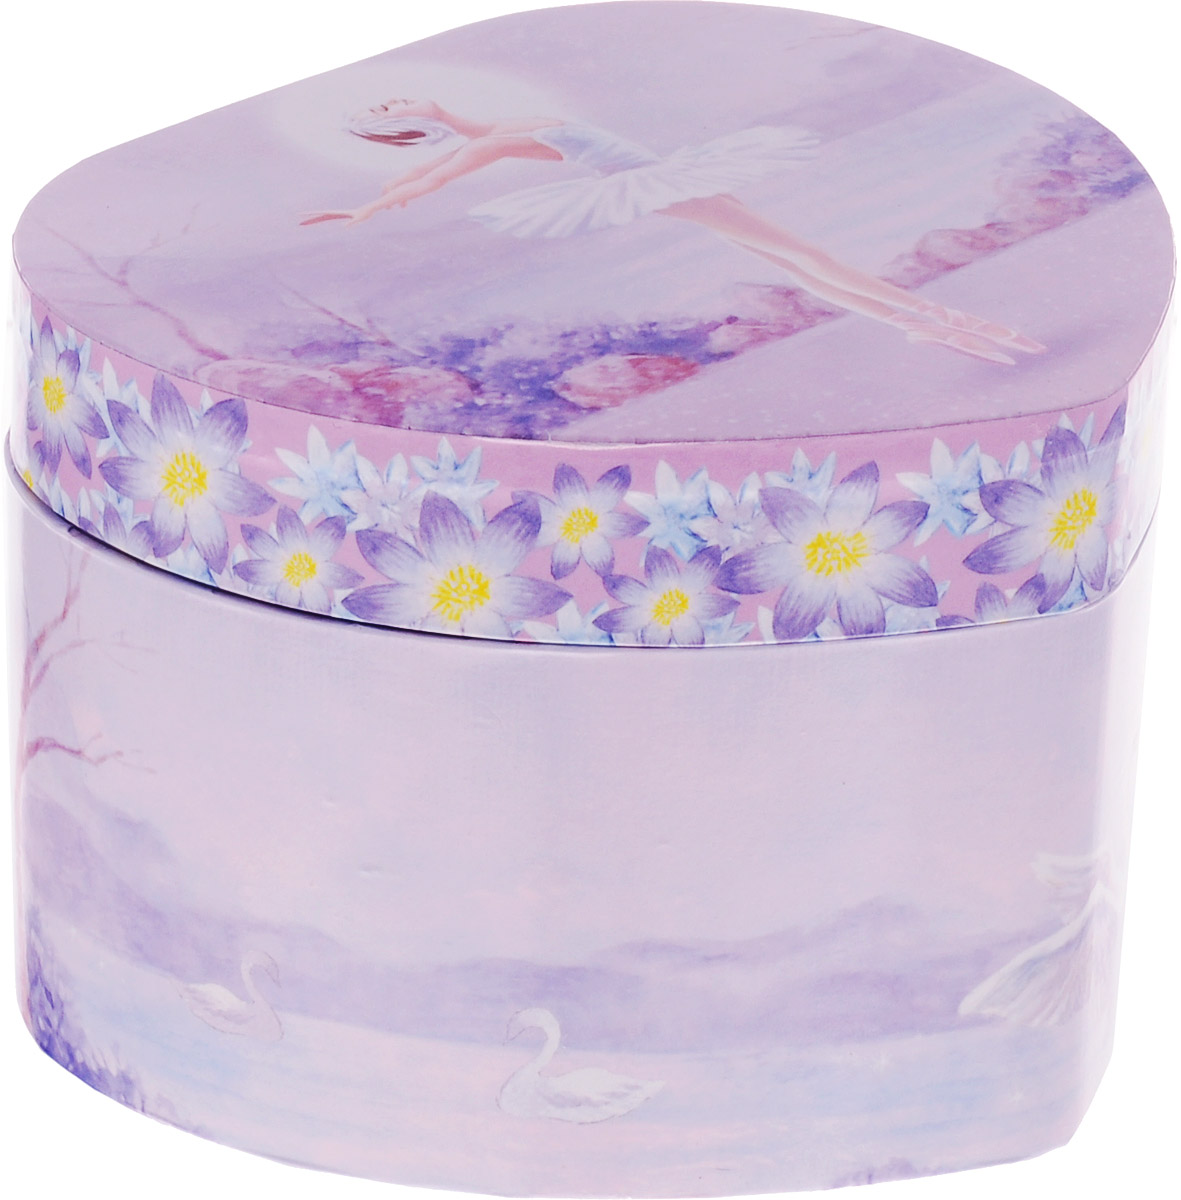 Jakos Музыкальная шкатулка Балерина цвет фиолетовый -  Детская комната